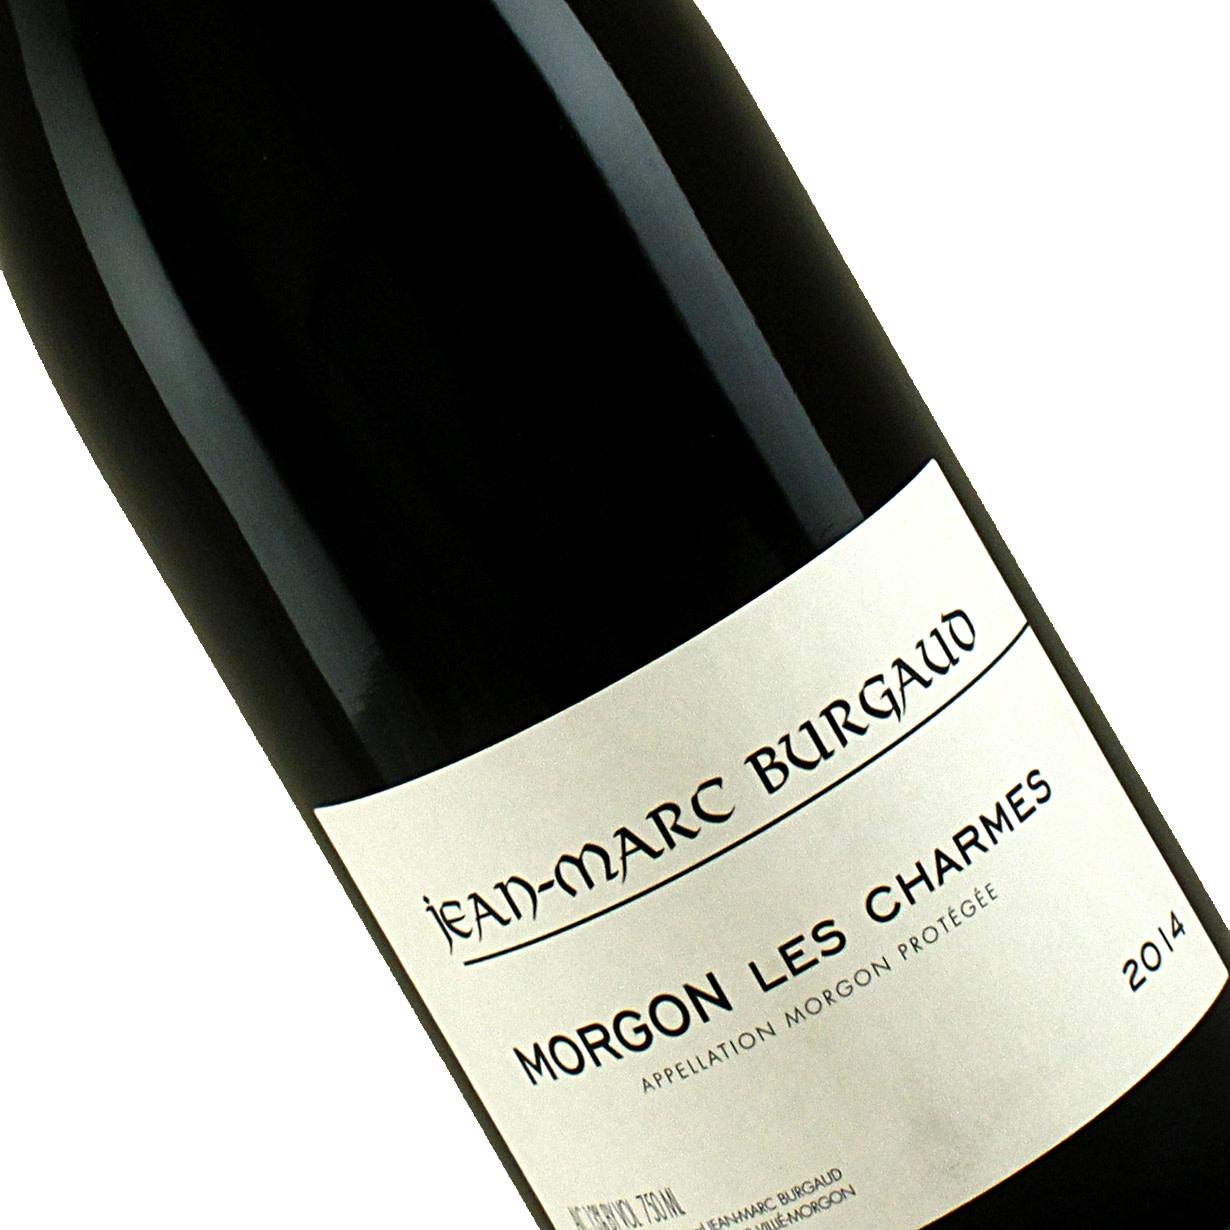 Jean-Marc Burgaud 2014 Morgon Les Charmes Burgundy